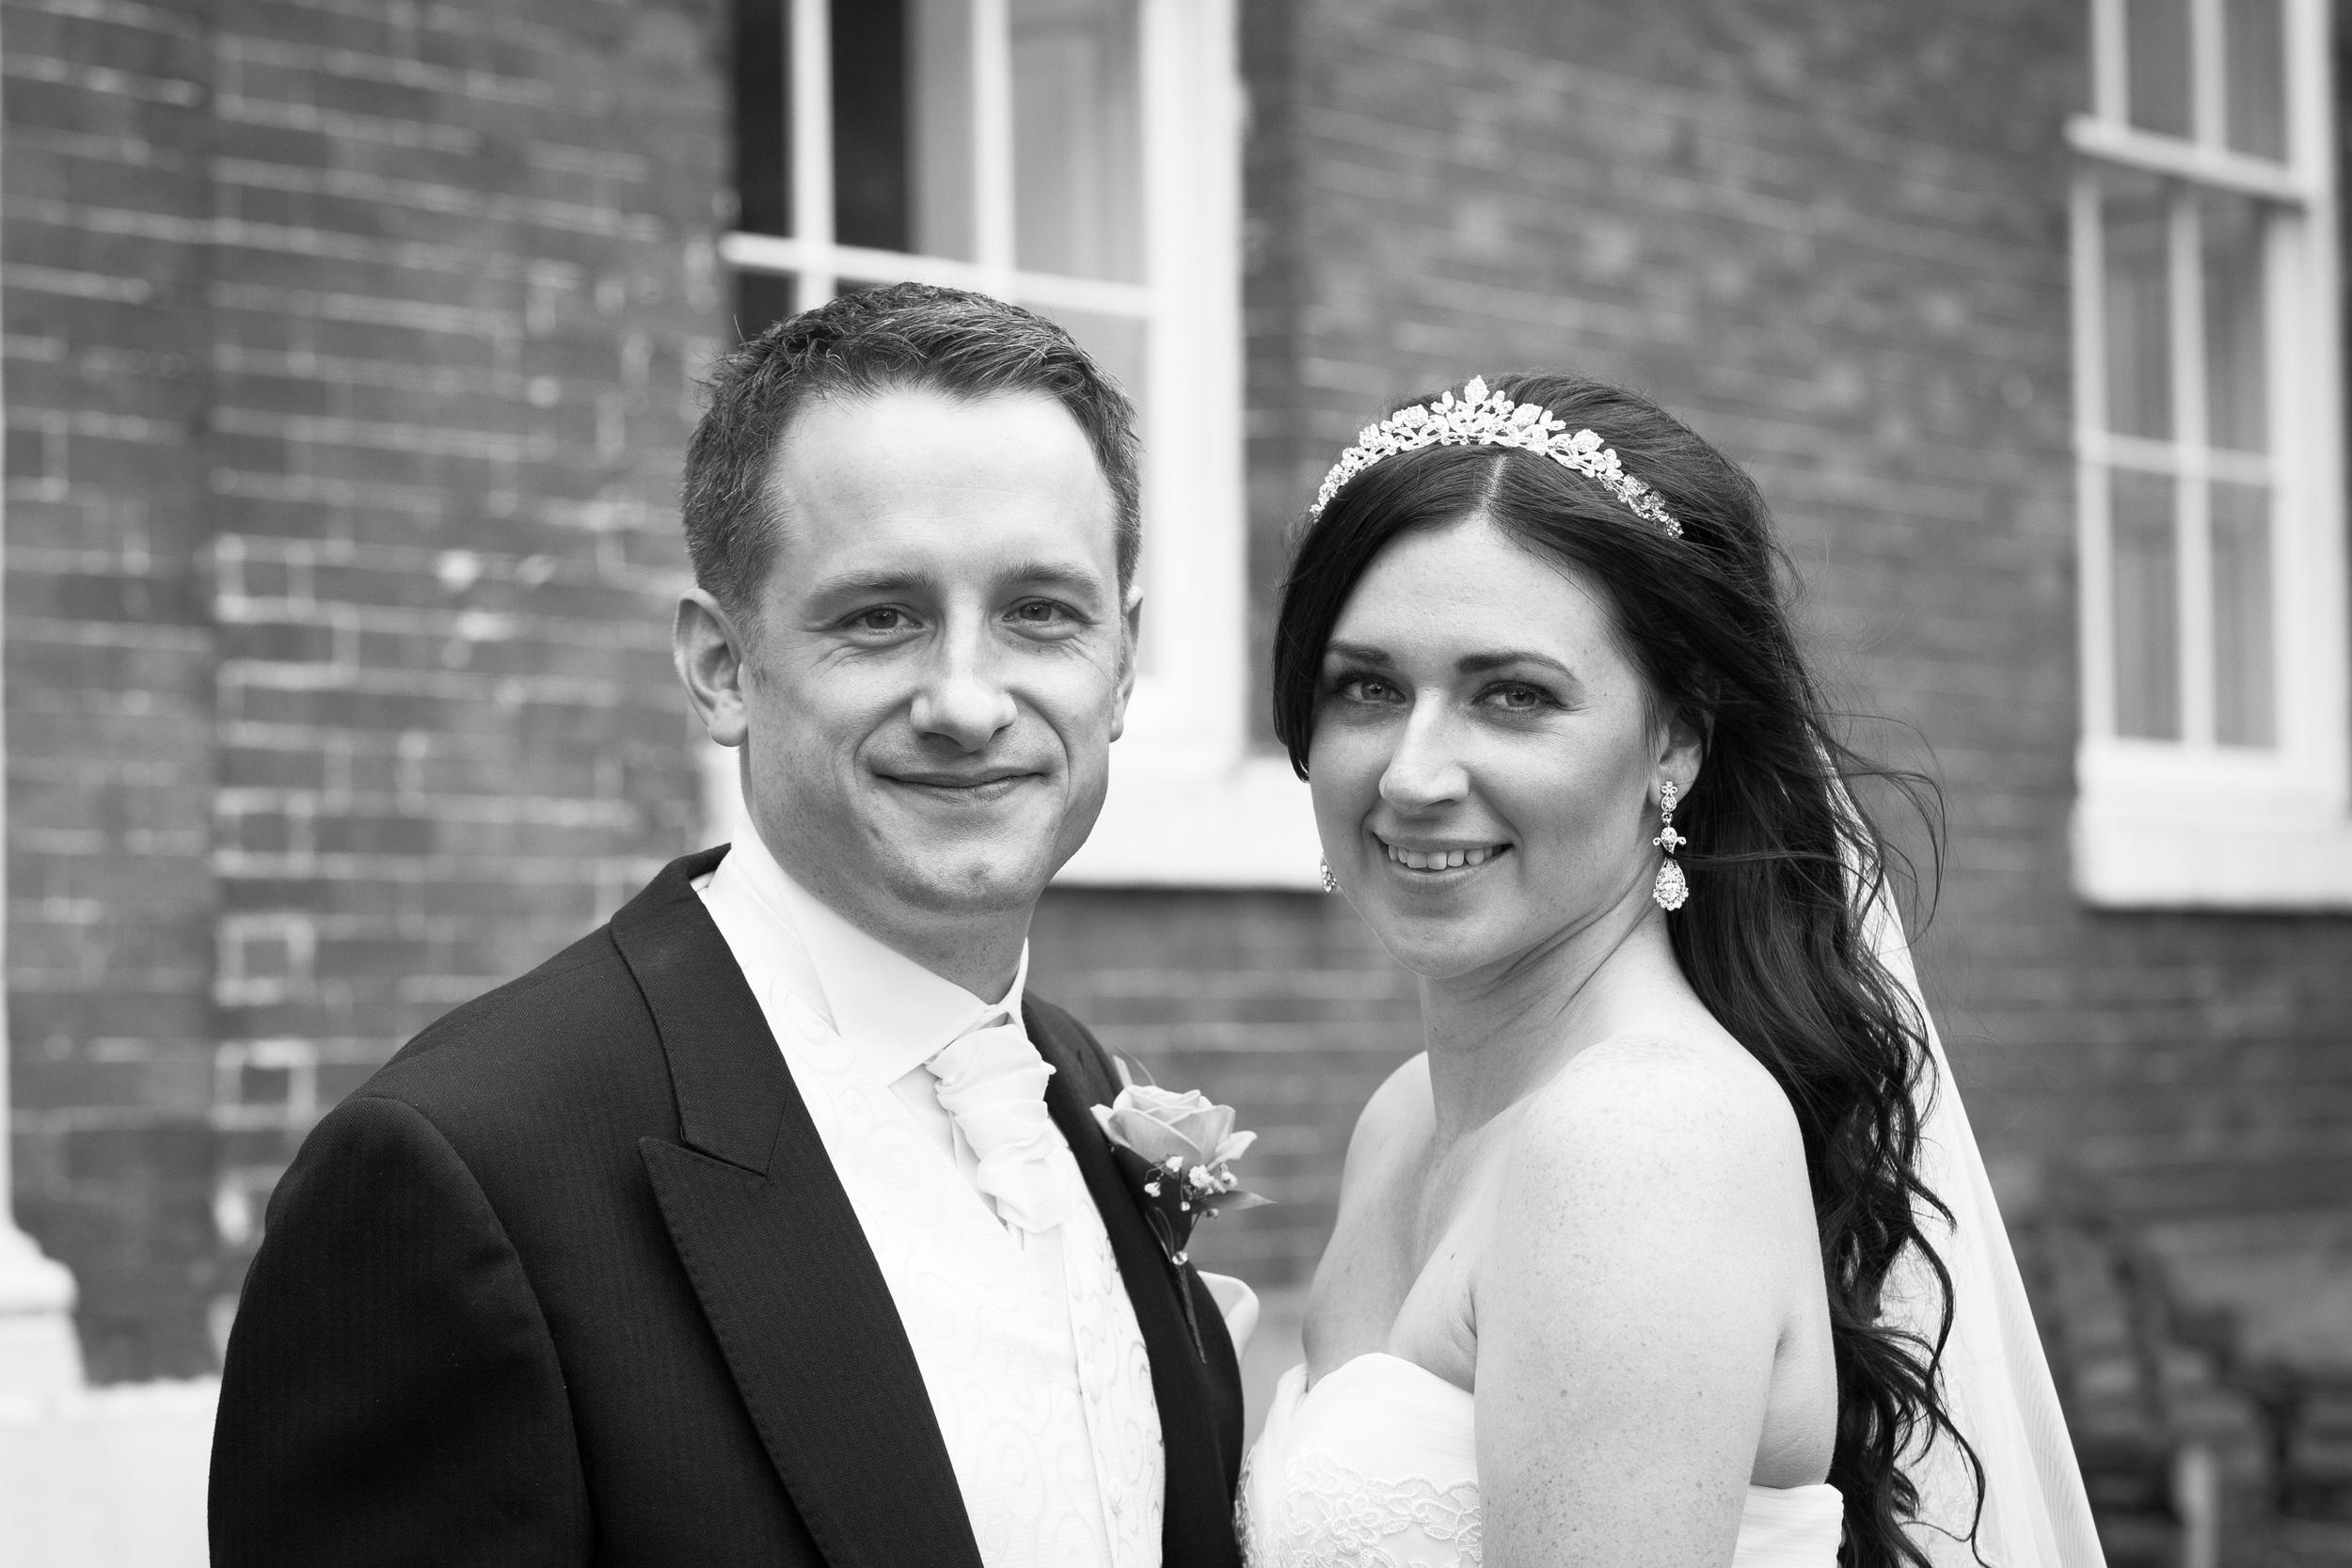 Mr-And-Mrs-Cunningham-183.jpg